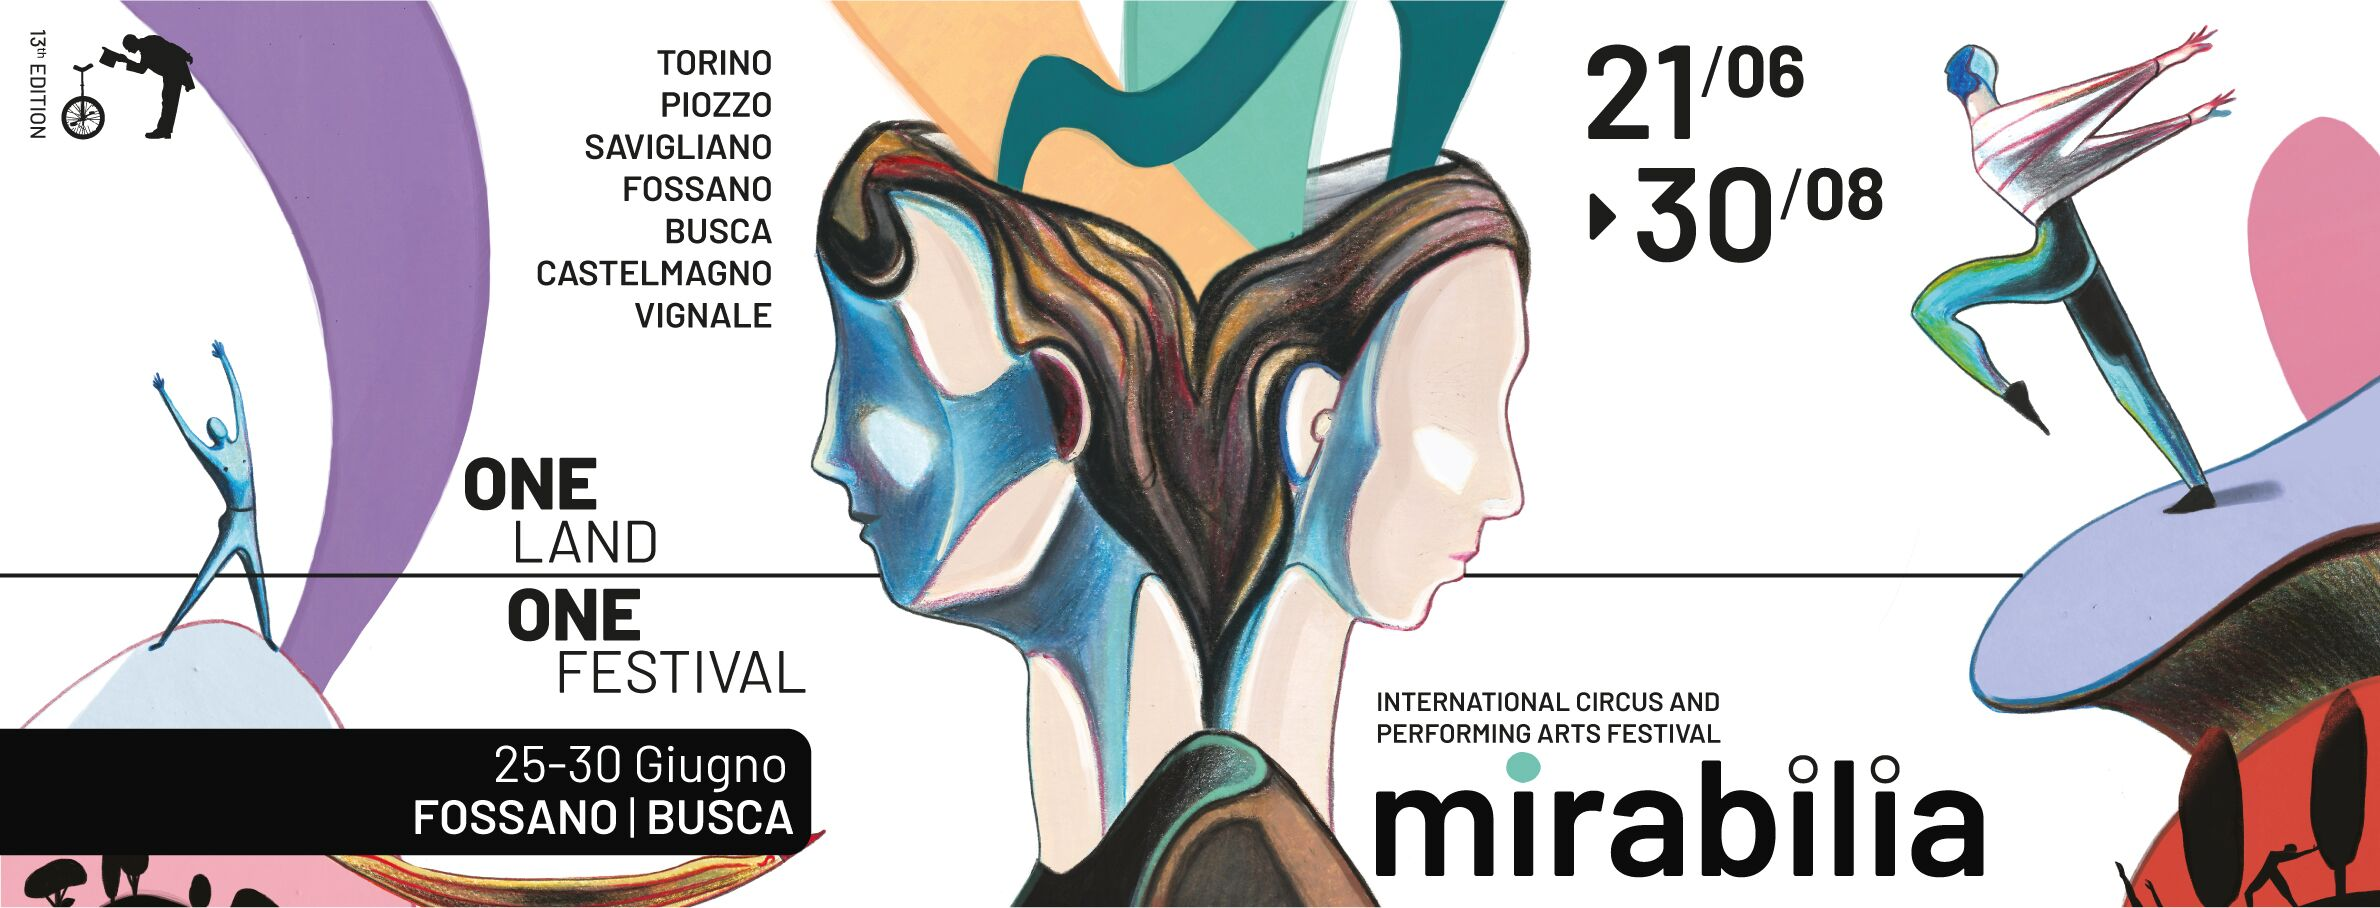 Mirabilia 2019